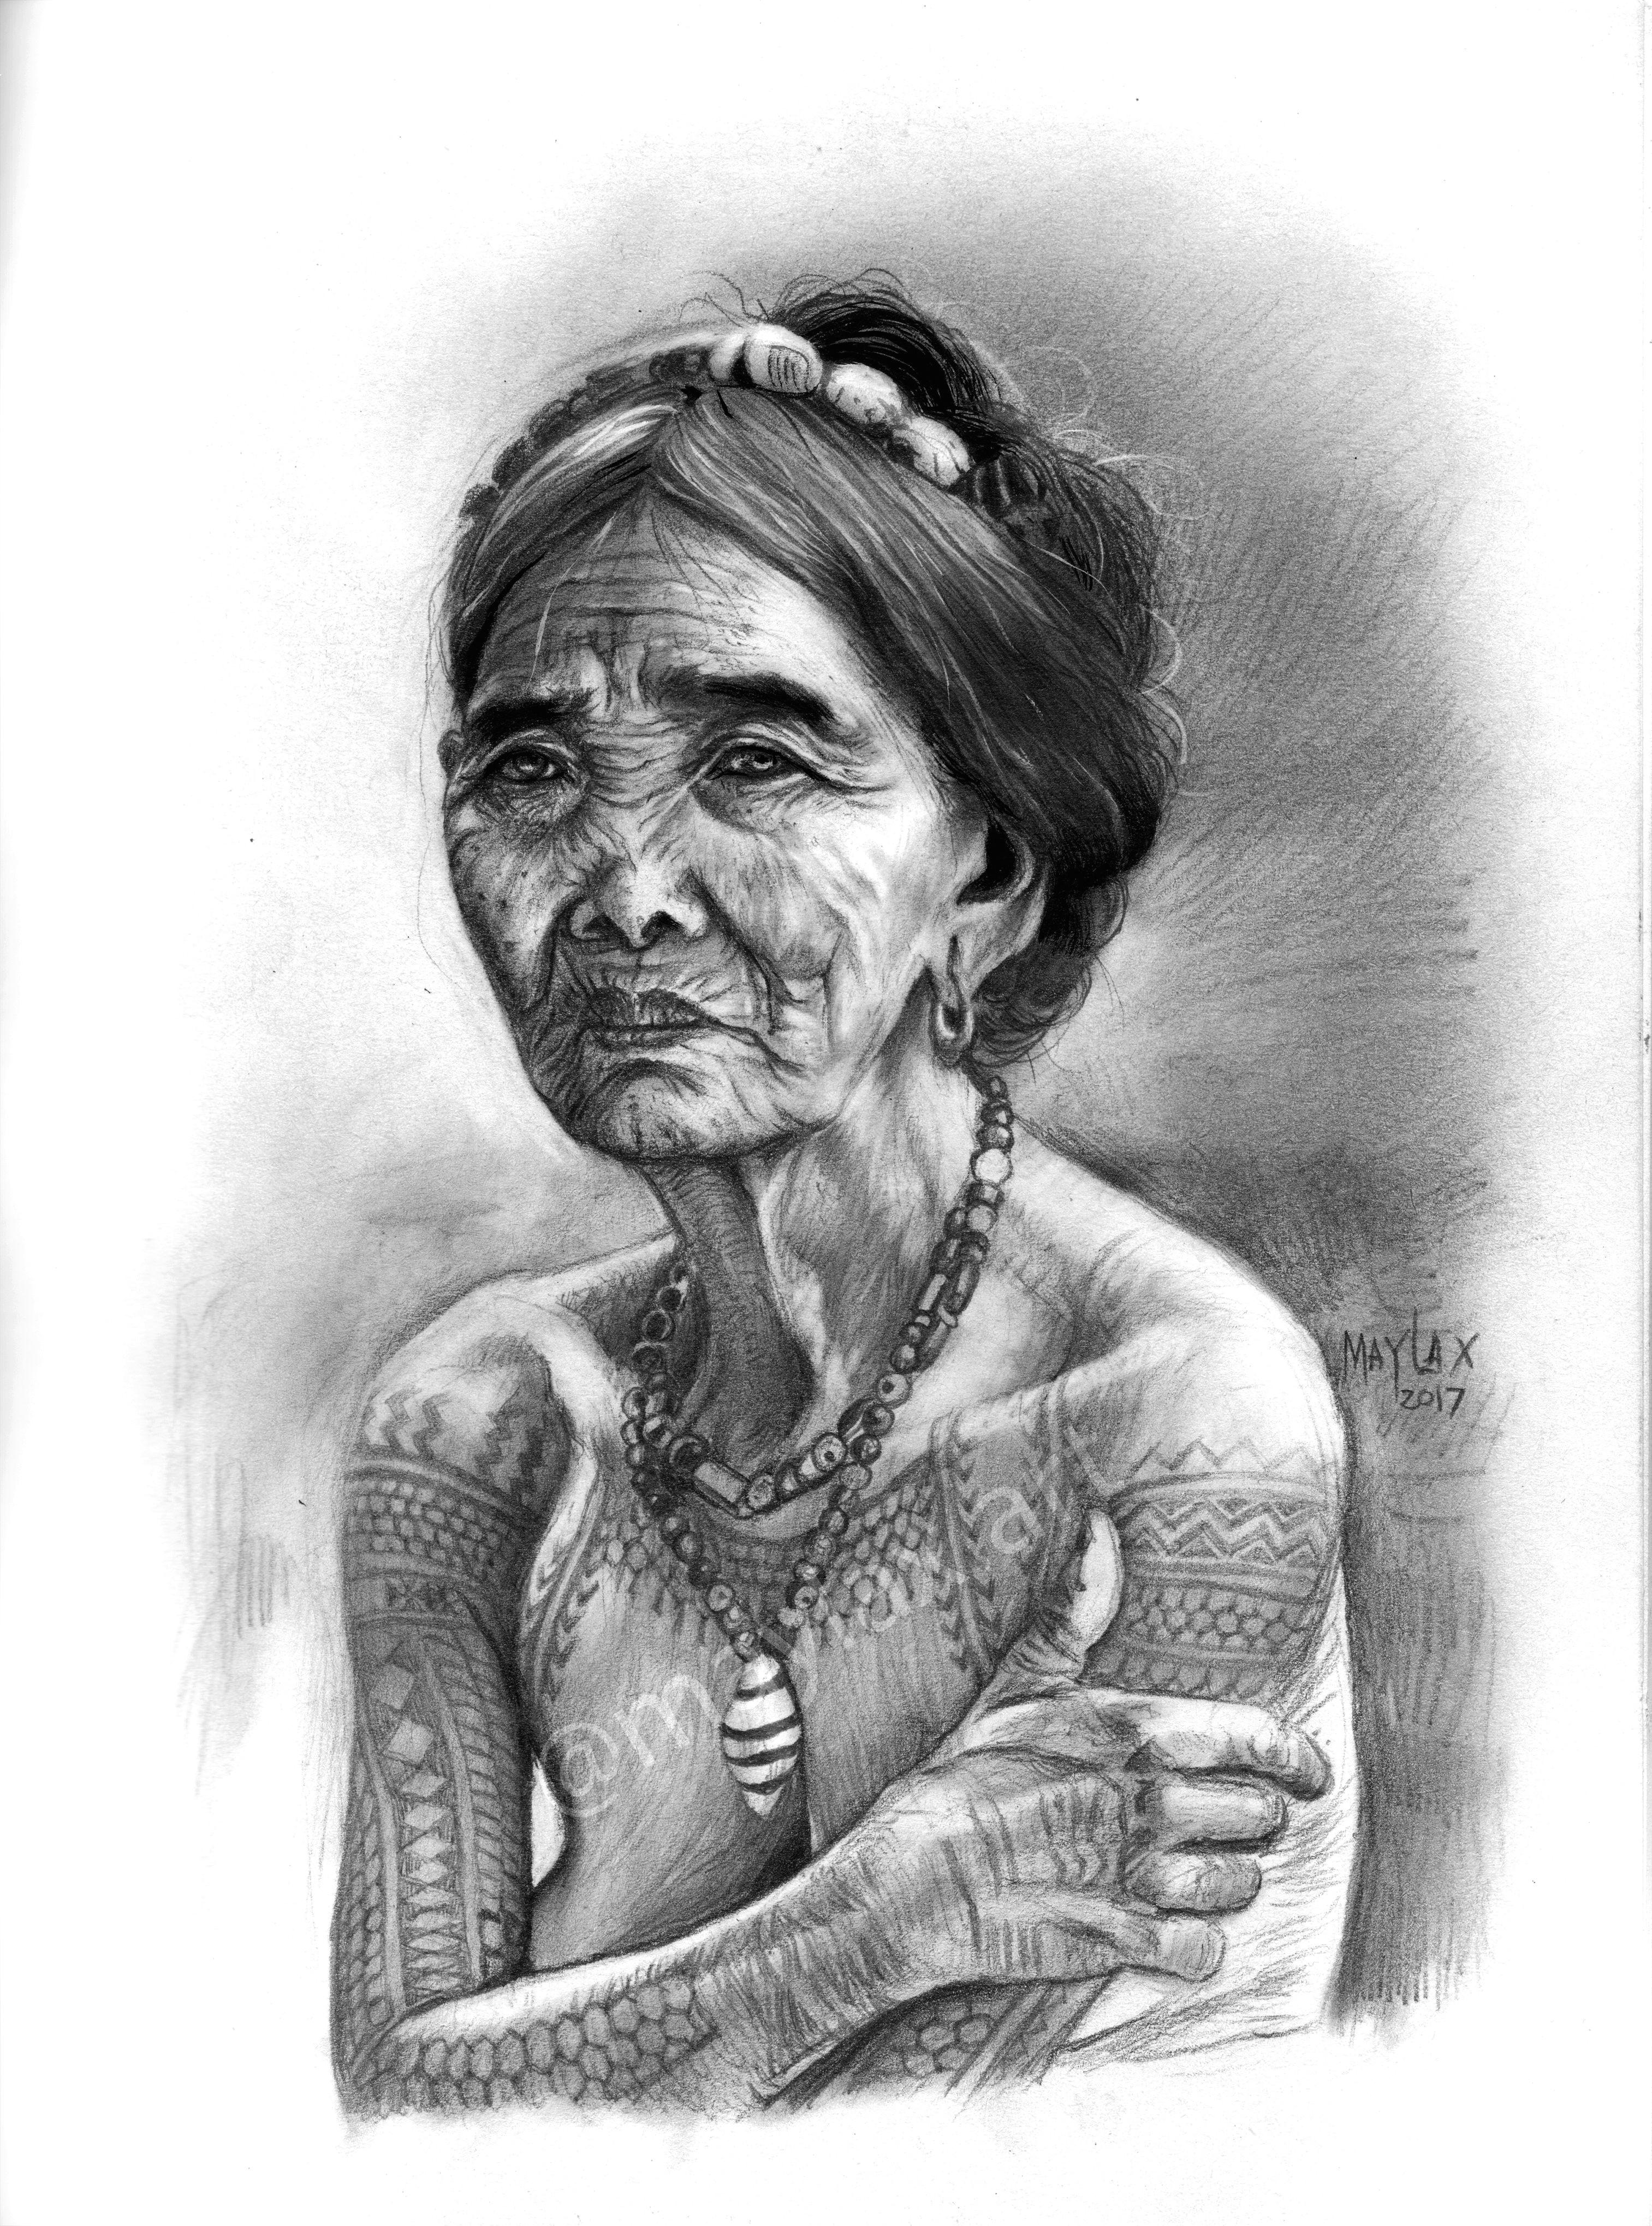 my apo whang od pencil portrait apowhangod apowhangod pinoyculture buscalan ink tribaltattoo artph tattoo pencilportrait